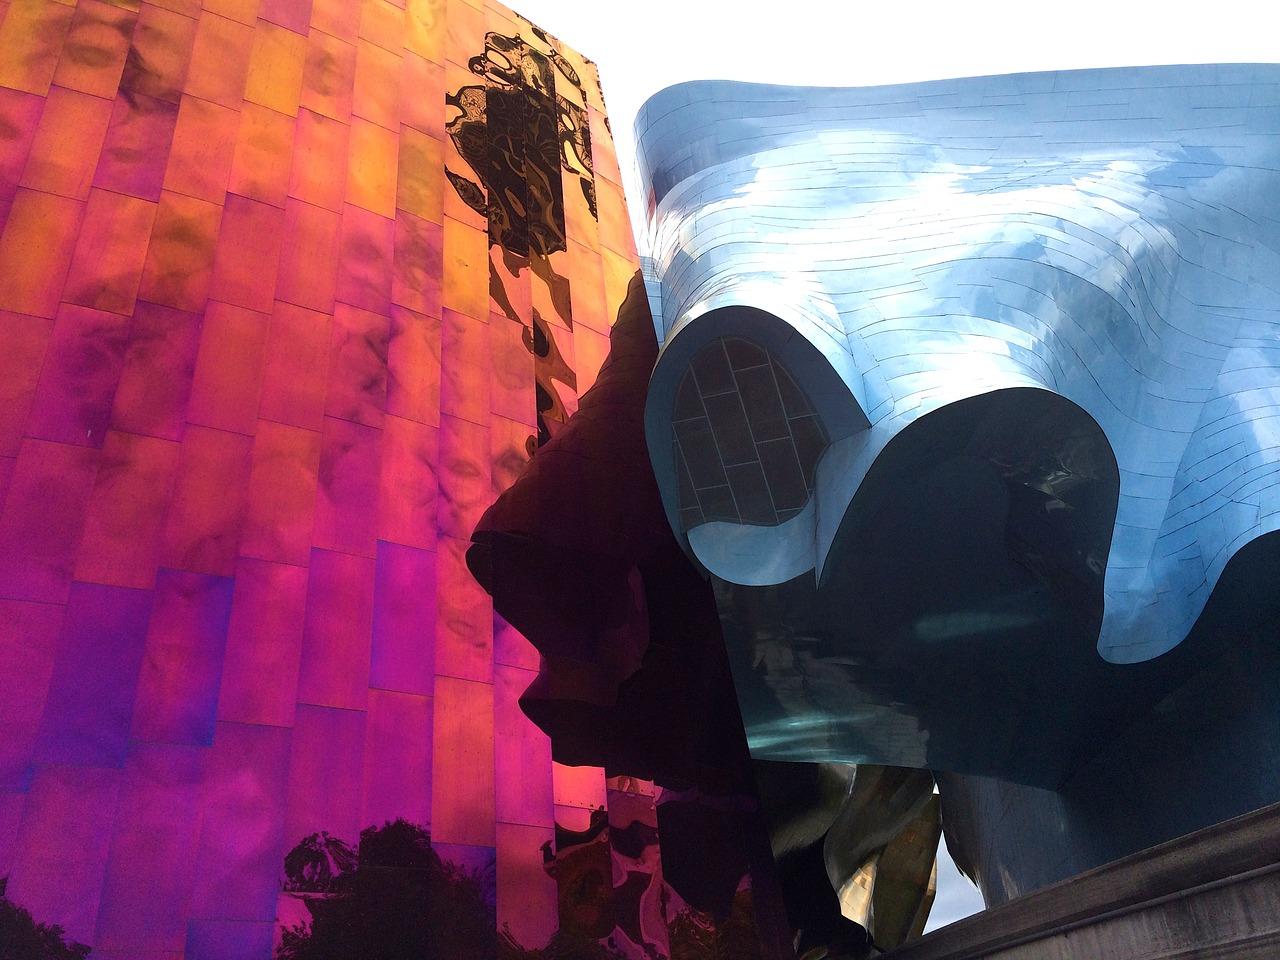 Blob-Architektur_Experience-Music-Hall-Seattle_1806